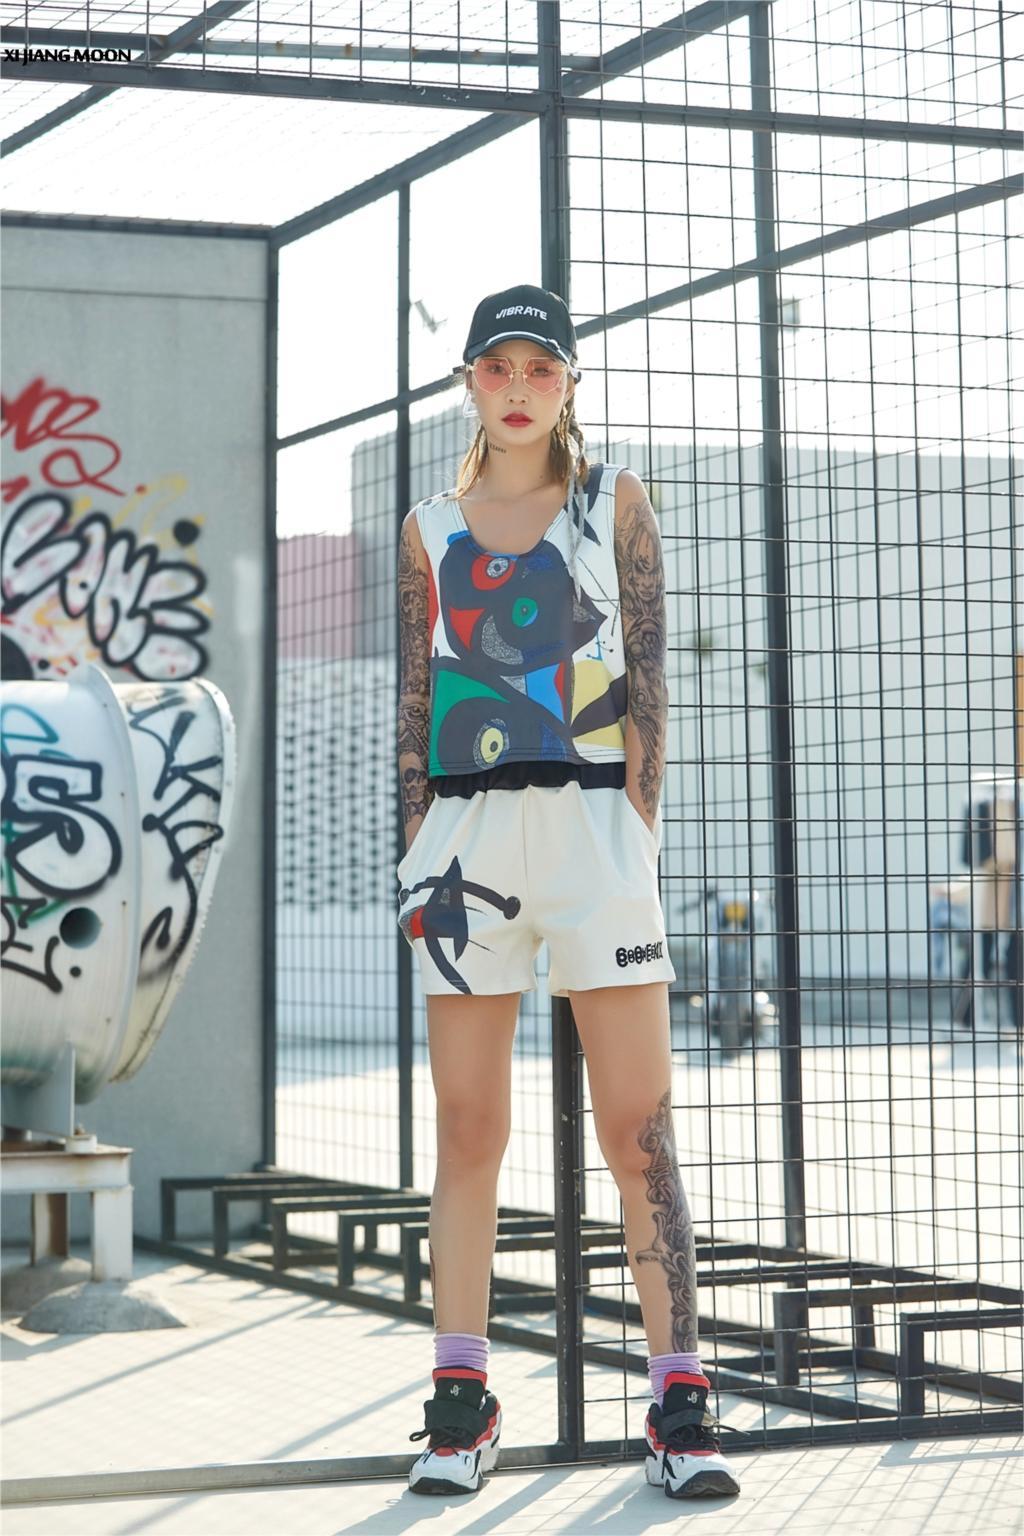 Sommer Trainingsanzug Für Frauen Mode Plus Größe Hip Hop Straße Harajuku Skateboard Lose Graffiti Street Dance Kurze Sets F418 Modische Muster